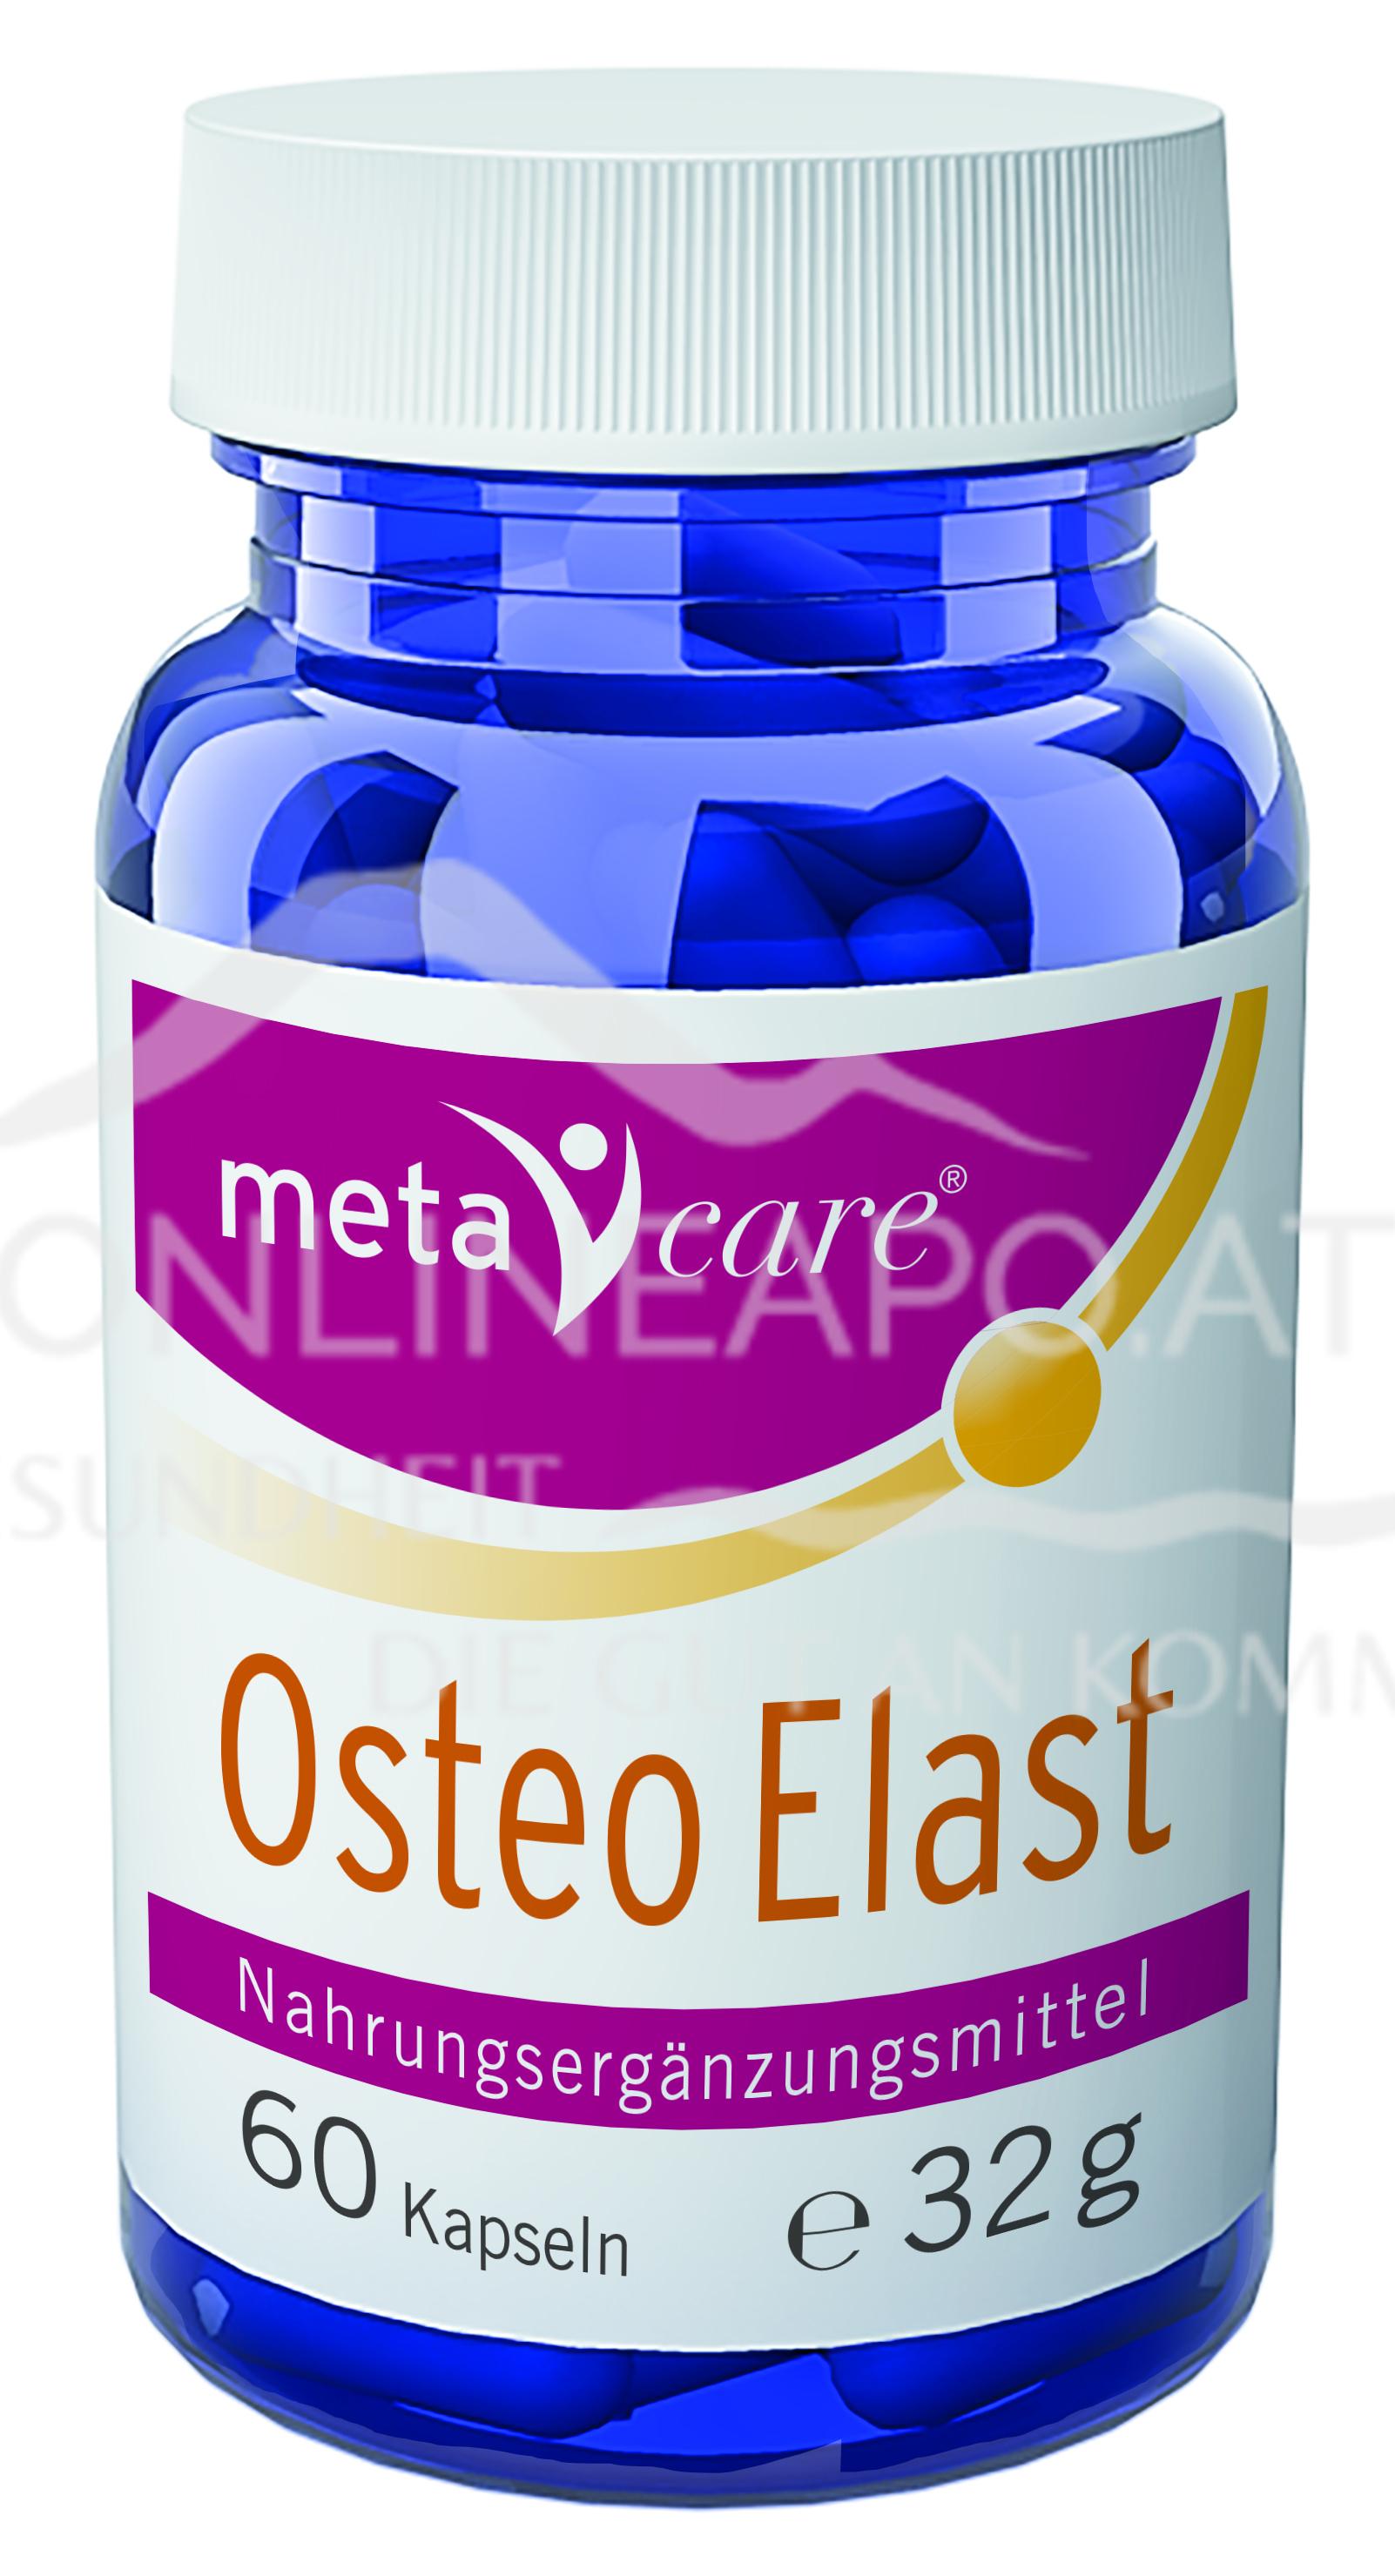 metacare® Osteo Elast